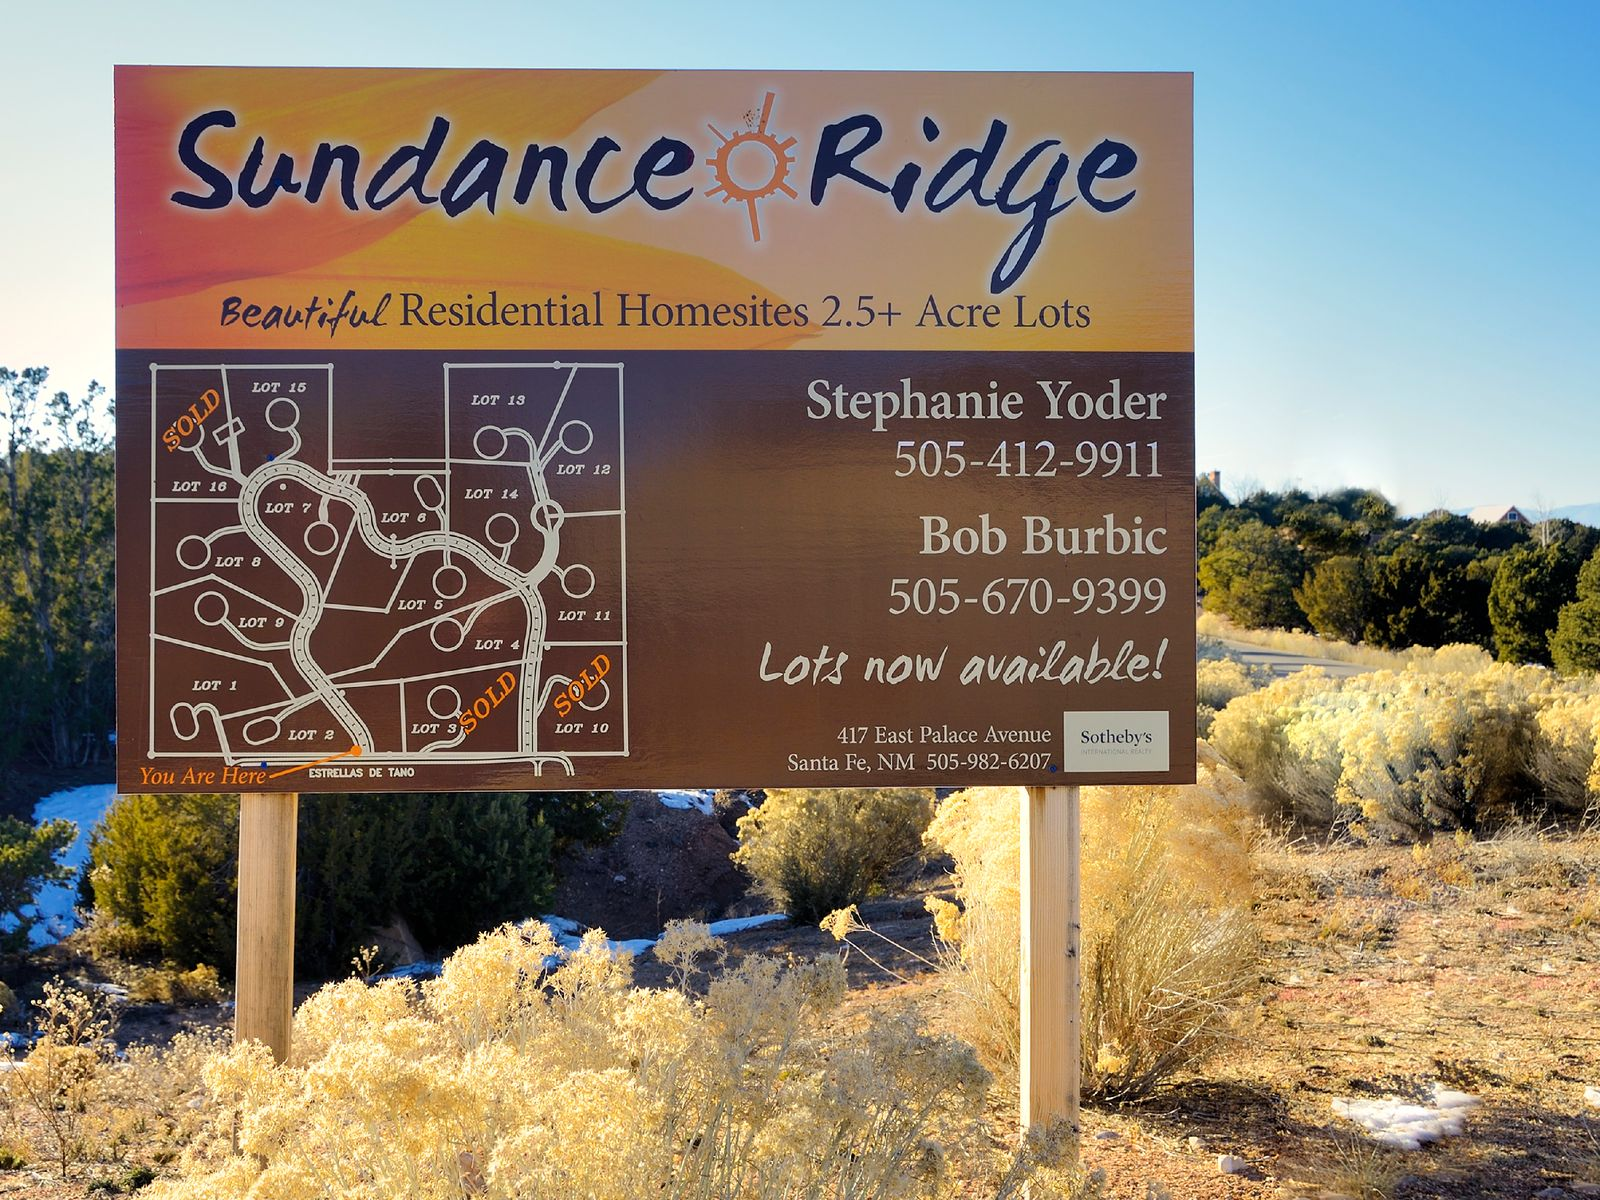 40 Sundance Ridge Lot 4